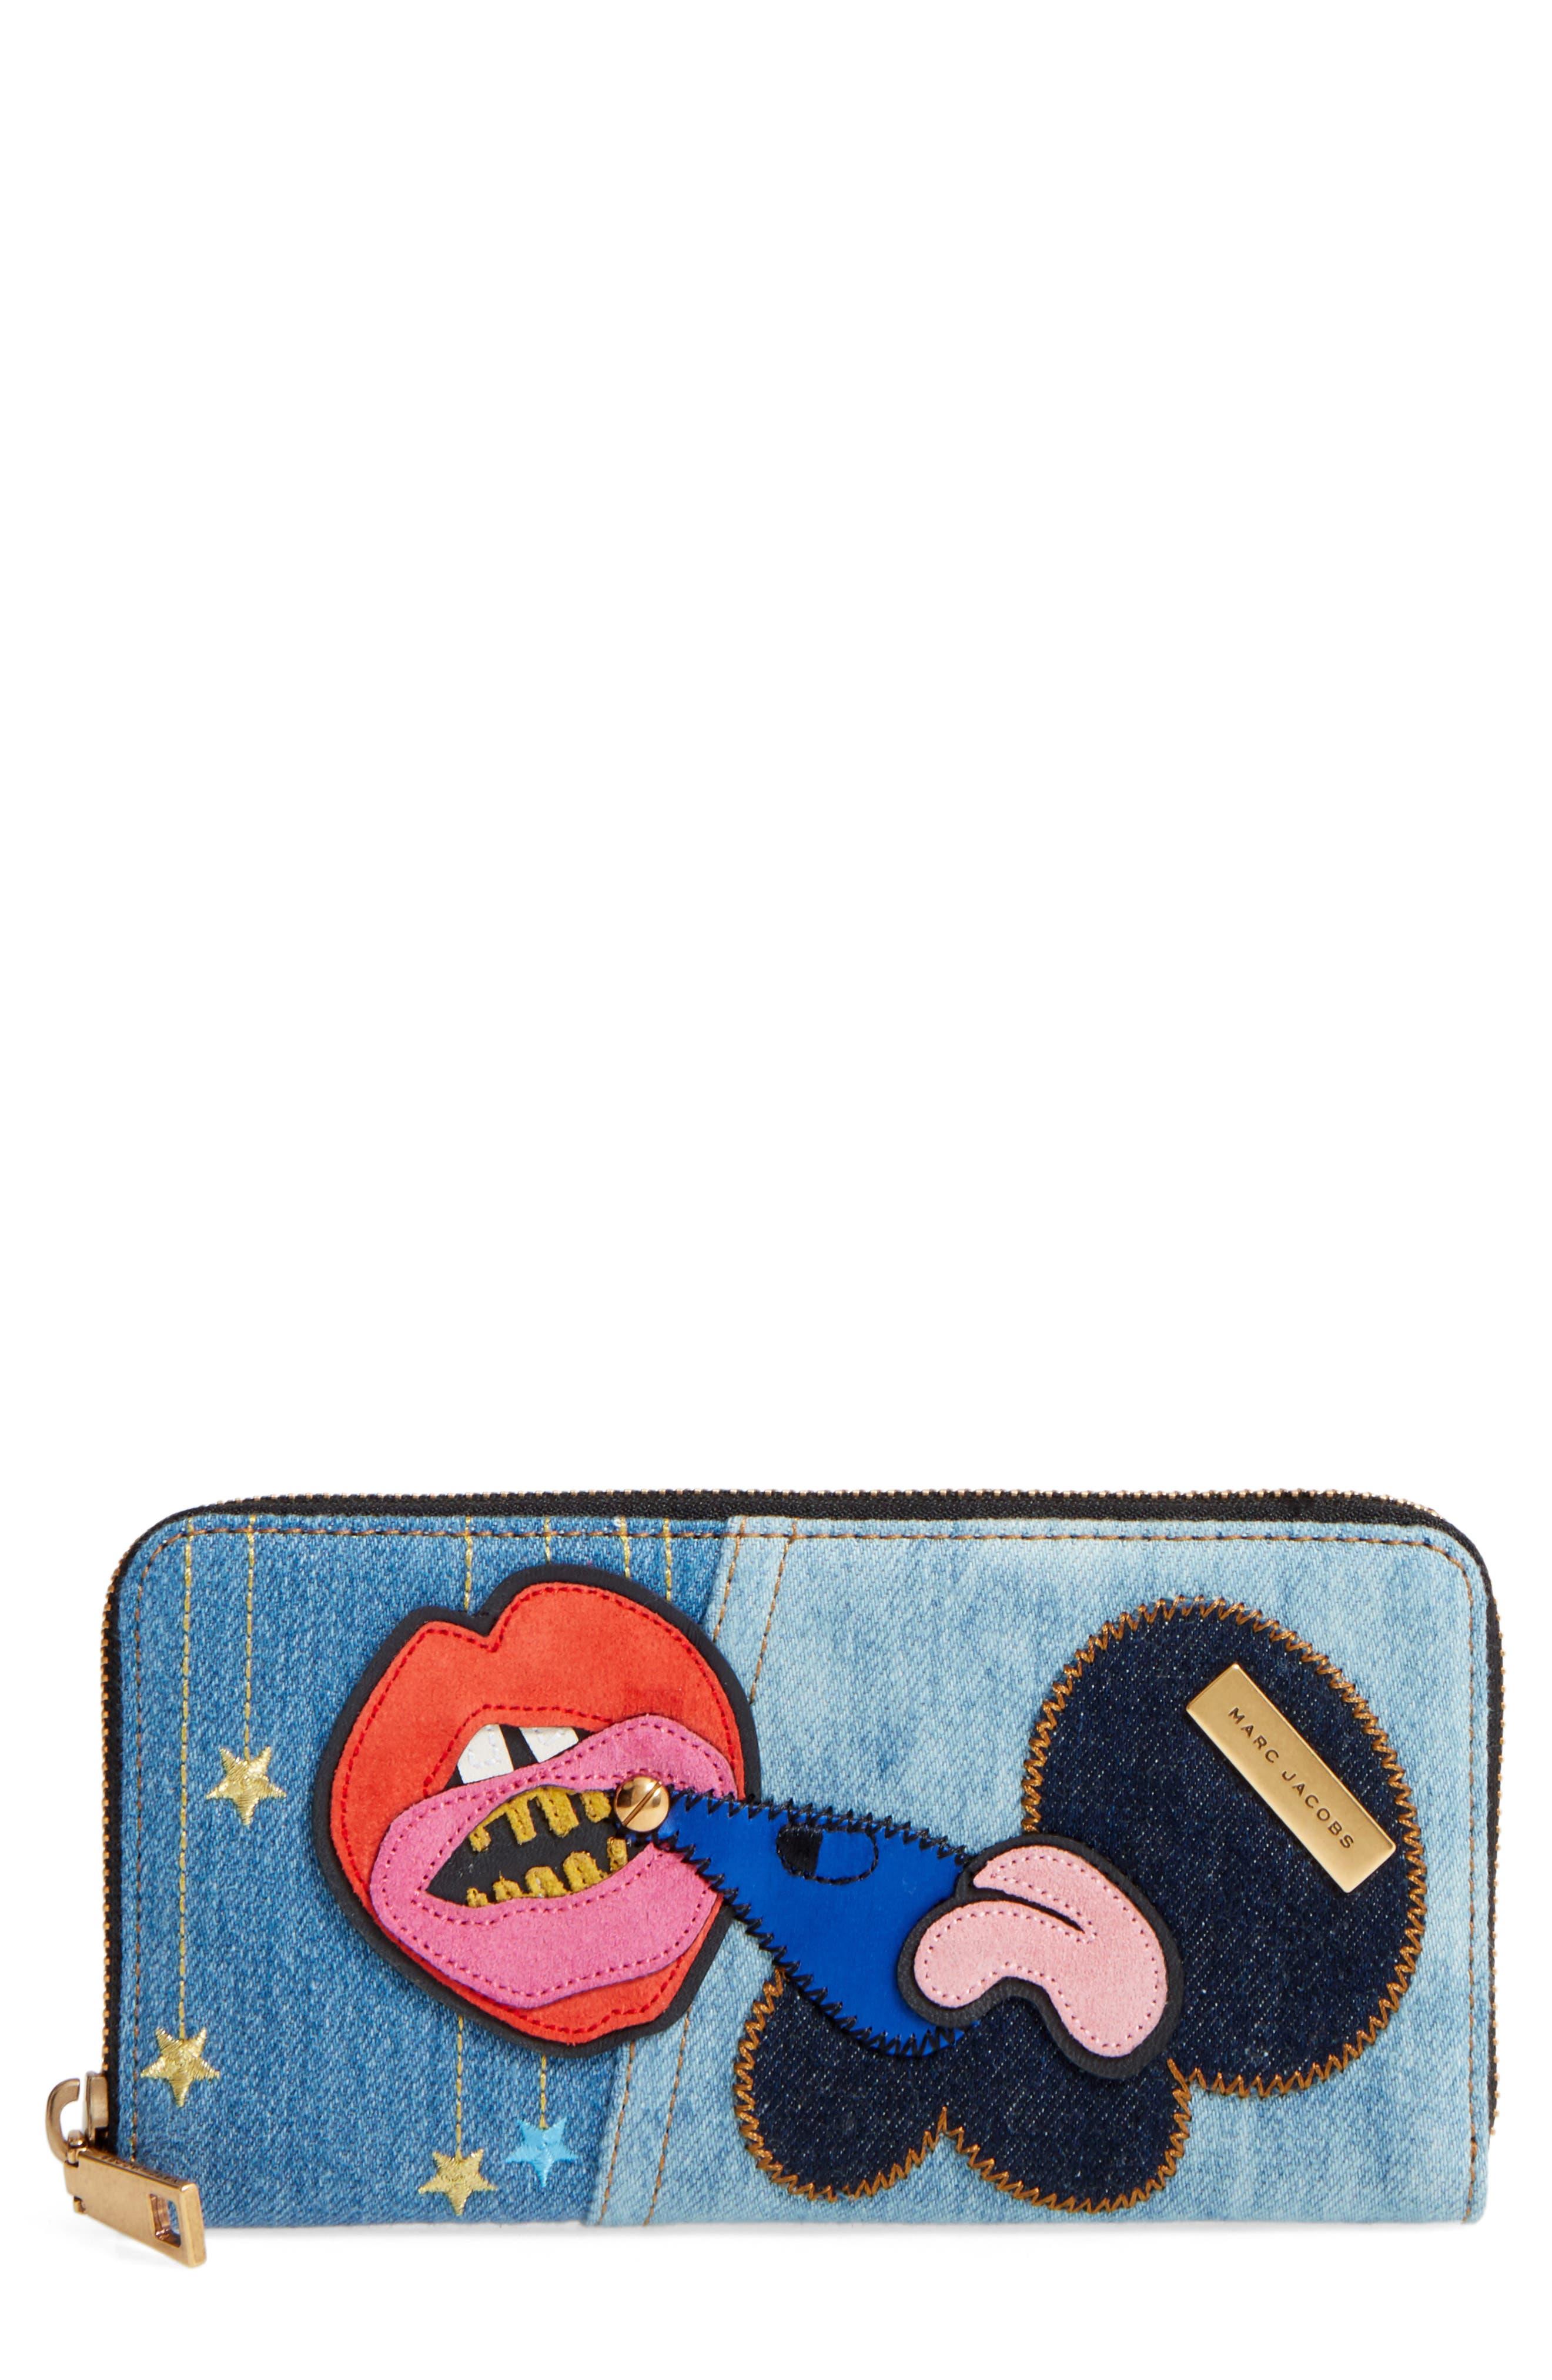 MARC JACOBS Denim Wallet